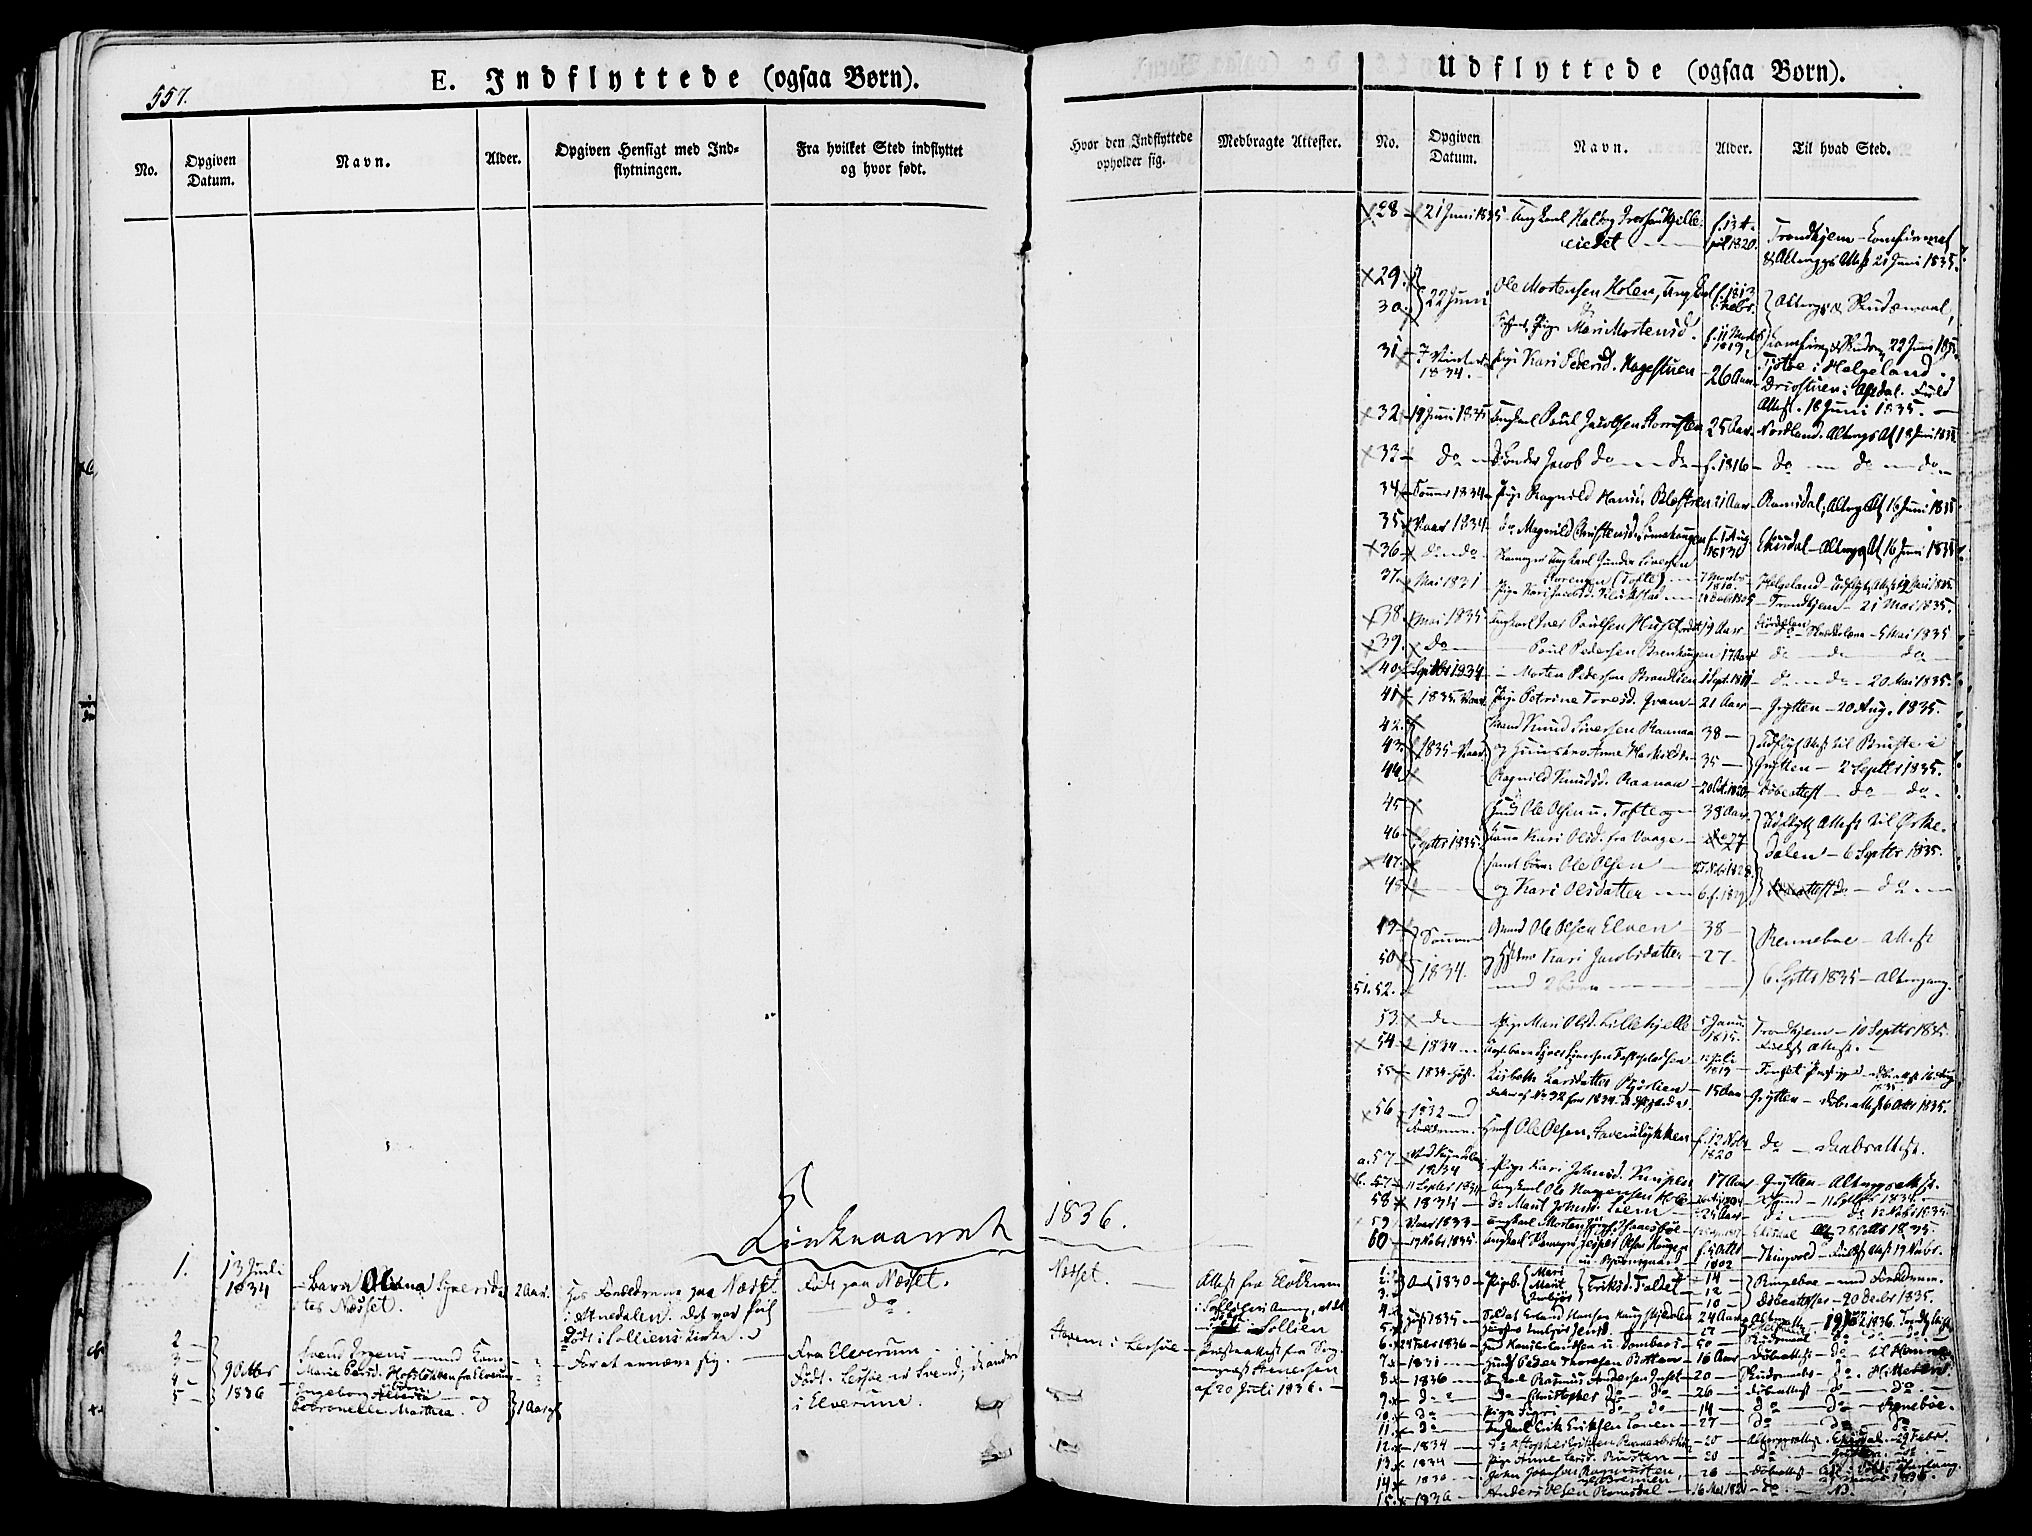 SAH, Lesja prestekontor, Ministerialbok nr. 5, 1830-1842, s. 557